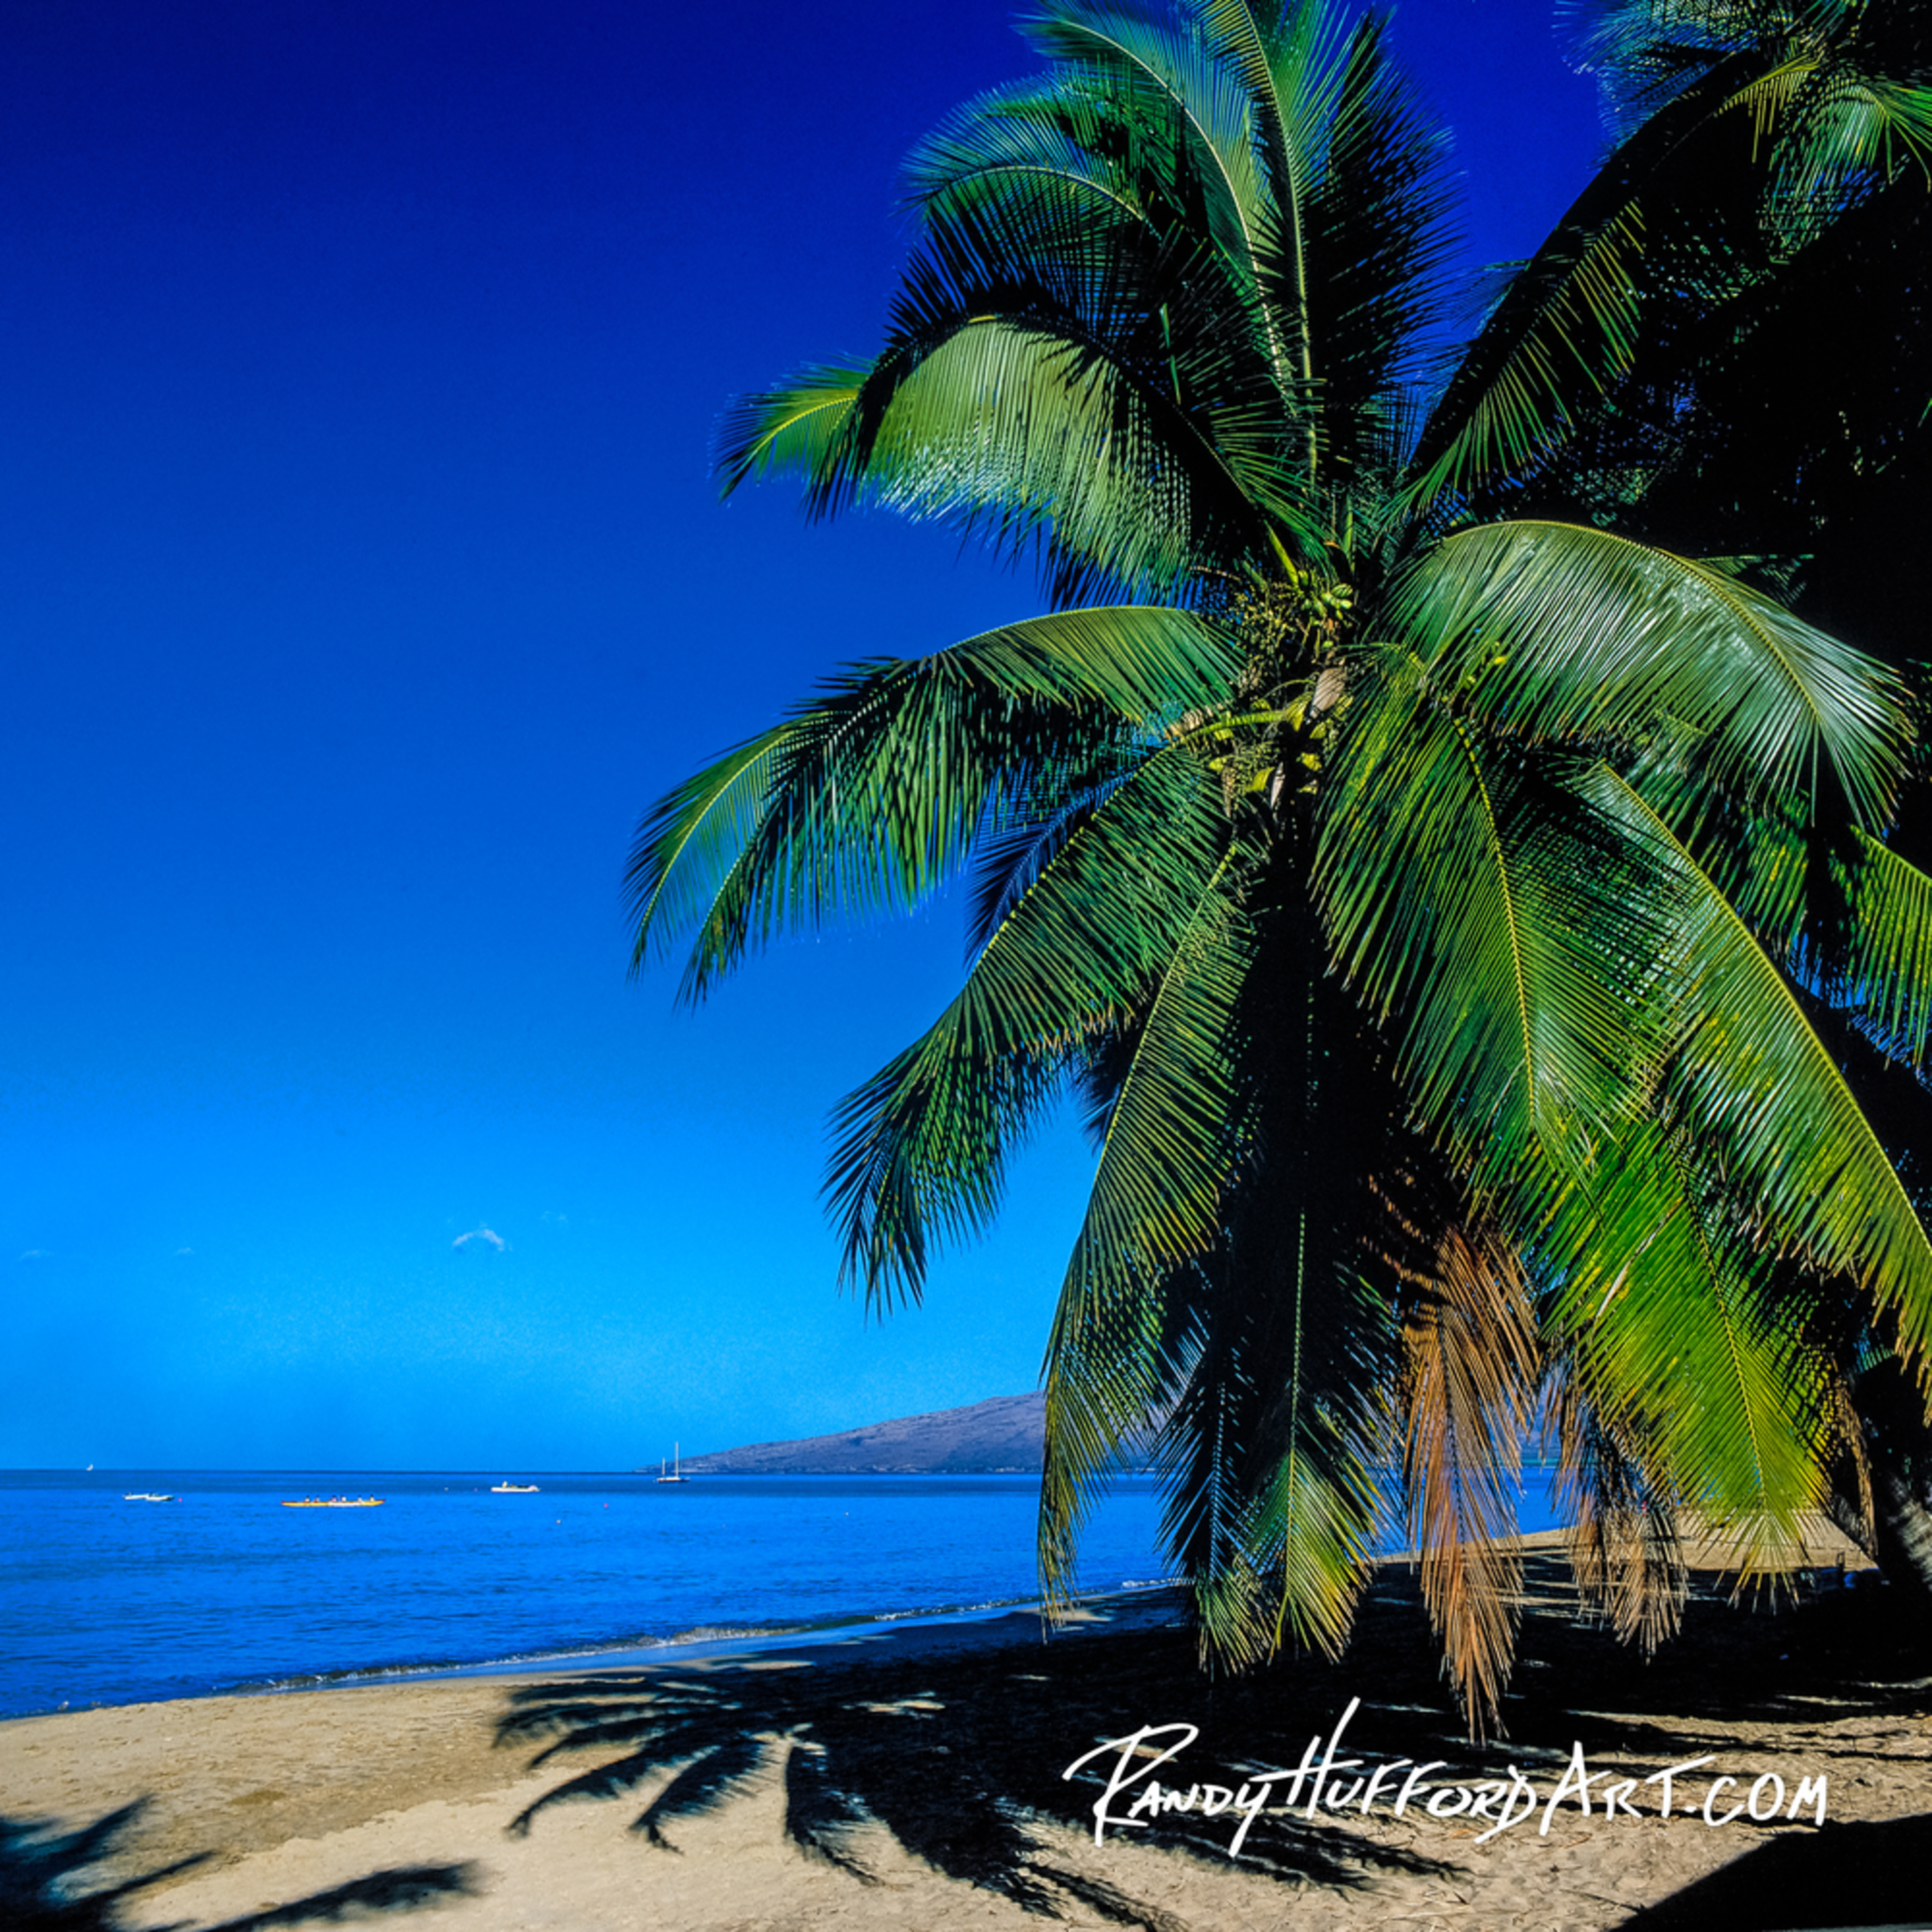 Beachpalm cv2 xw4lta